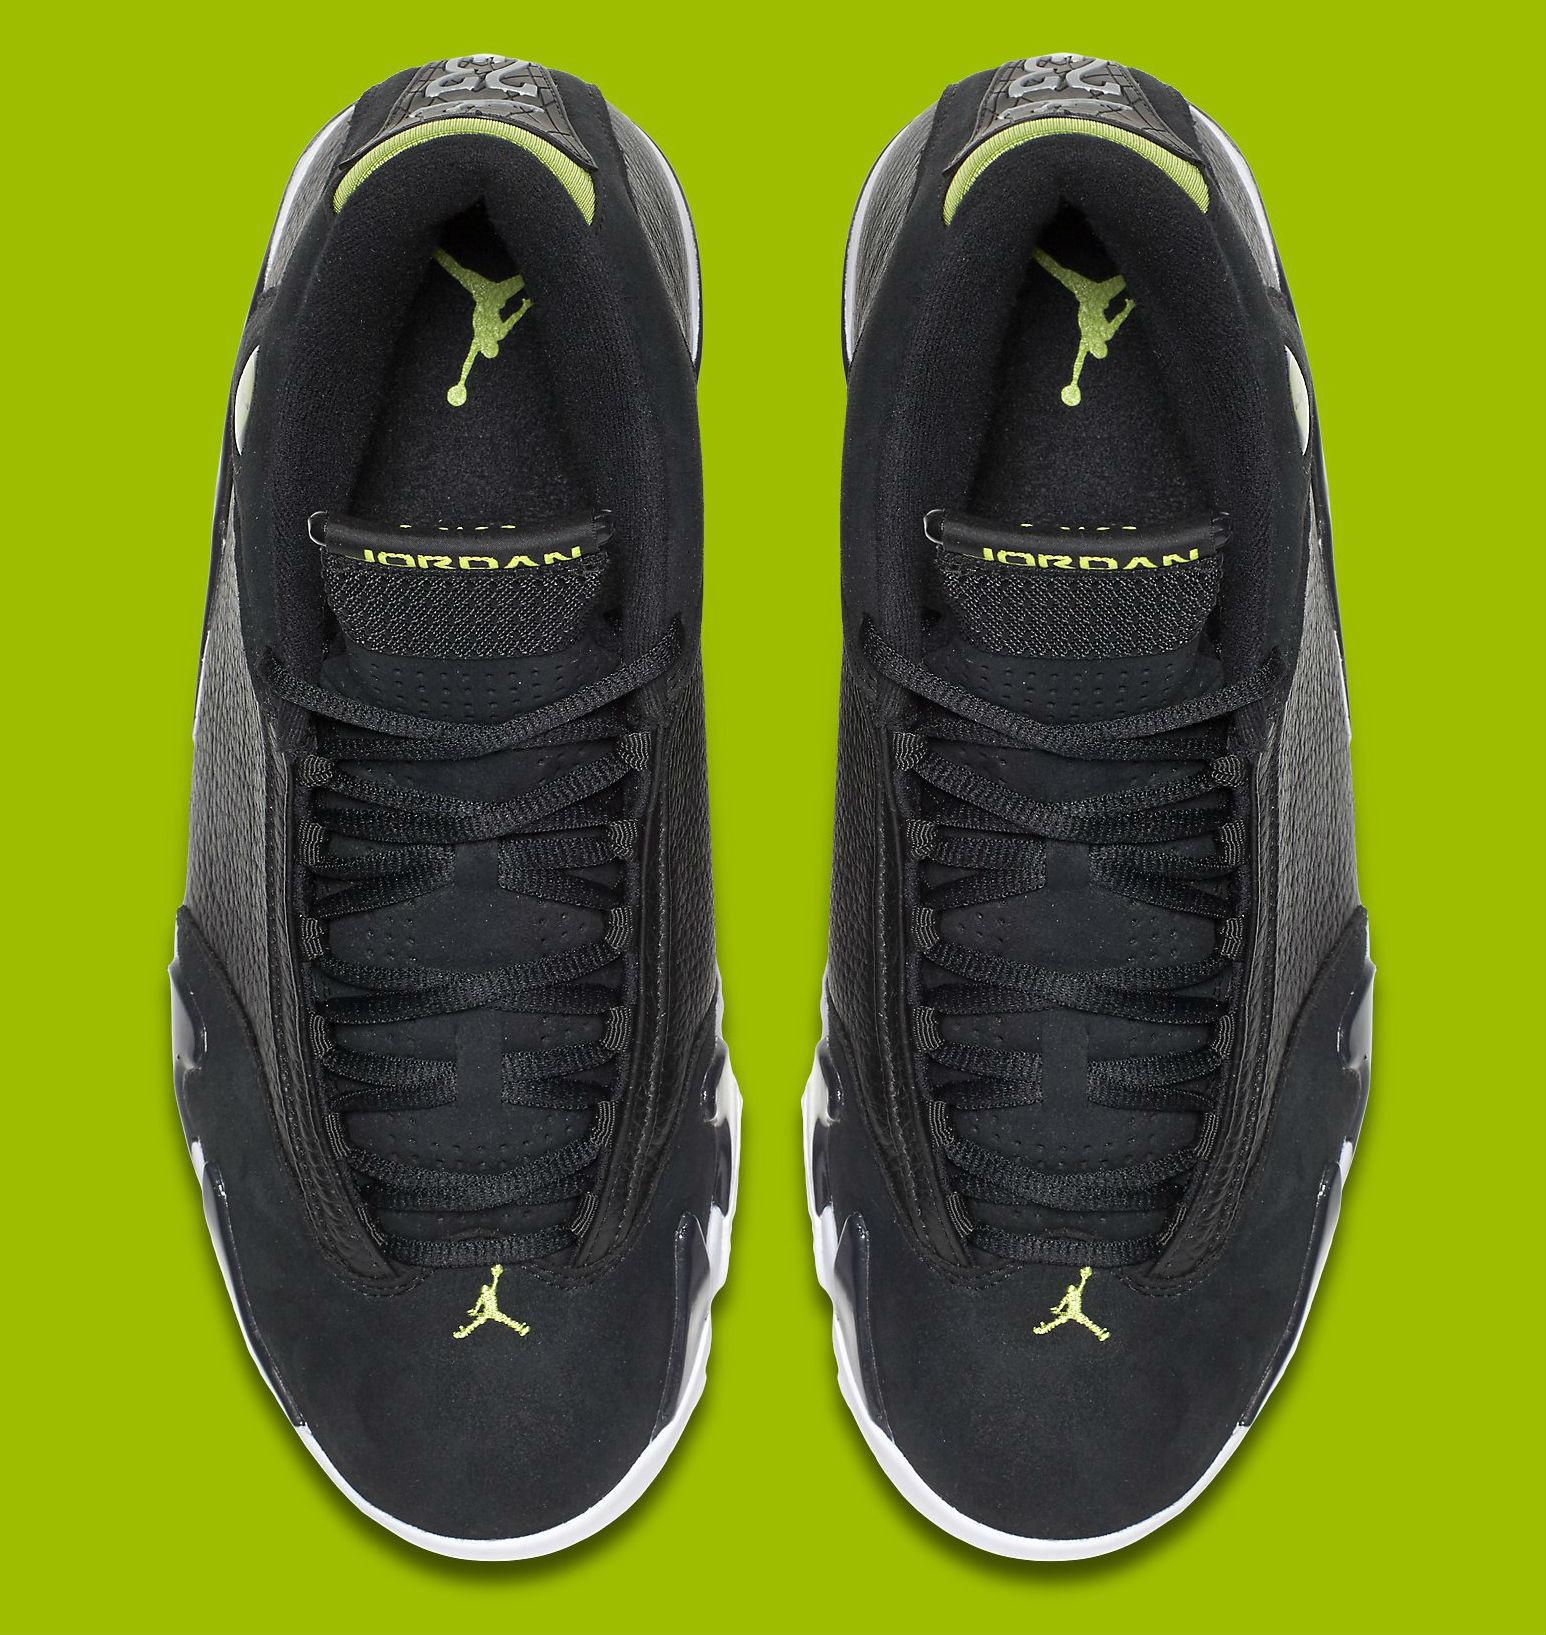 a3907c26cb6 Indiglo Jordan 14 Release Date | Sole Collector